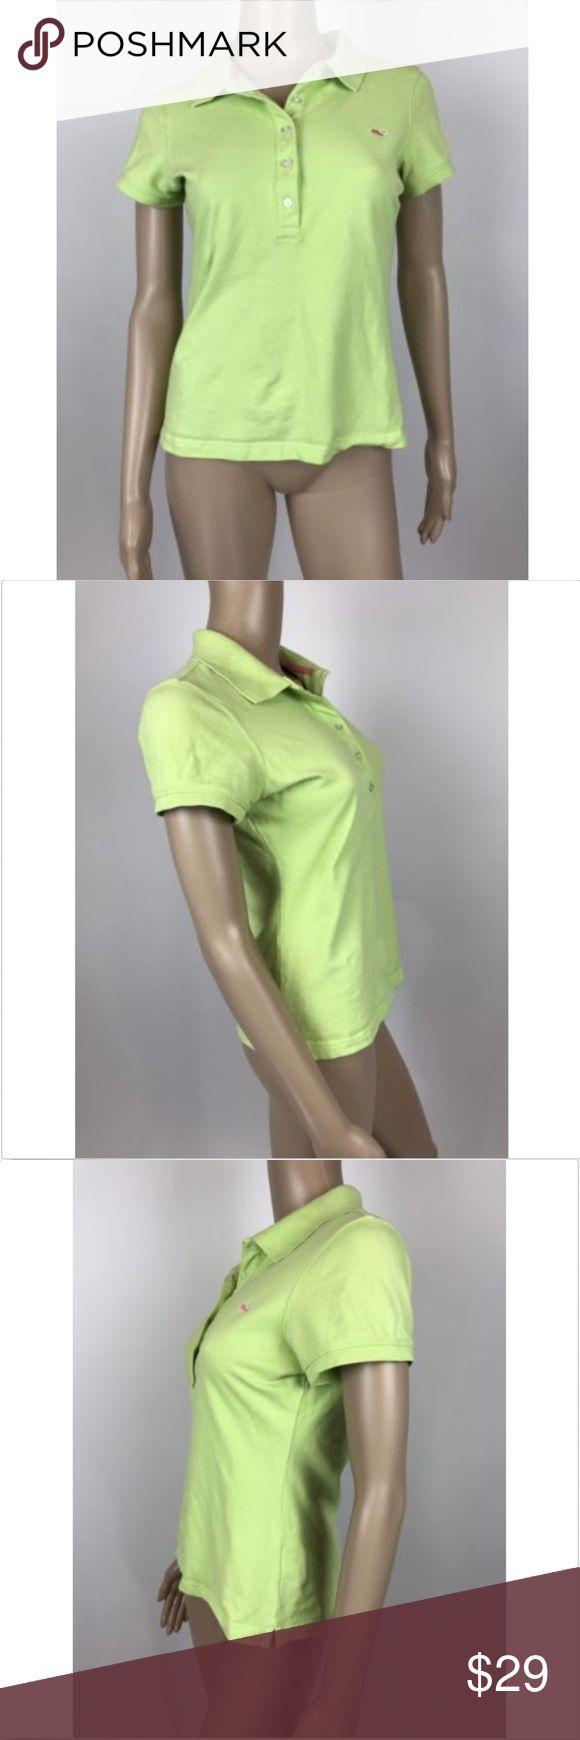 "Vineyard Vines Lime Green Polo Shirt Sz Small Vineyard Vines women's lime green short sleeve stretch polo shirt sz small Measurements laying flat Armpit to Armpit 19"" Length 22"" Vineyard Vines Tops"